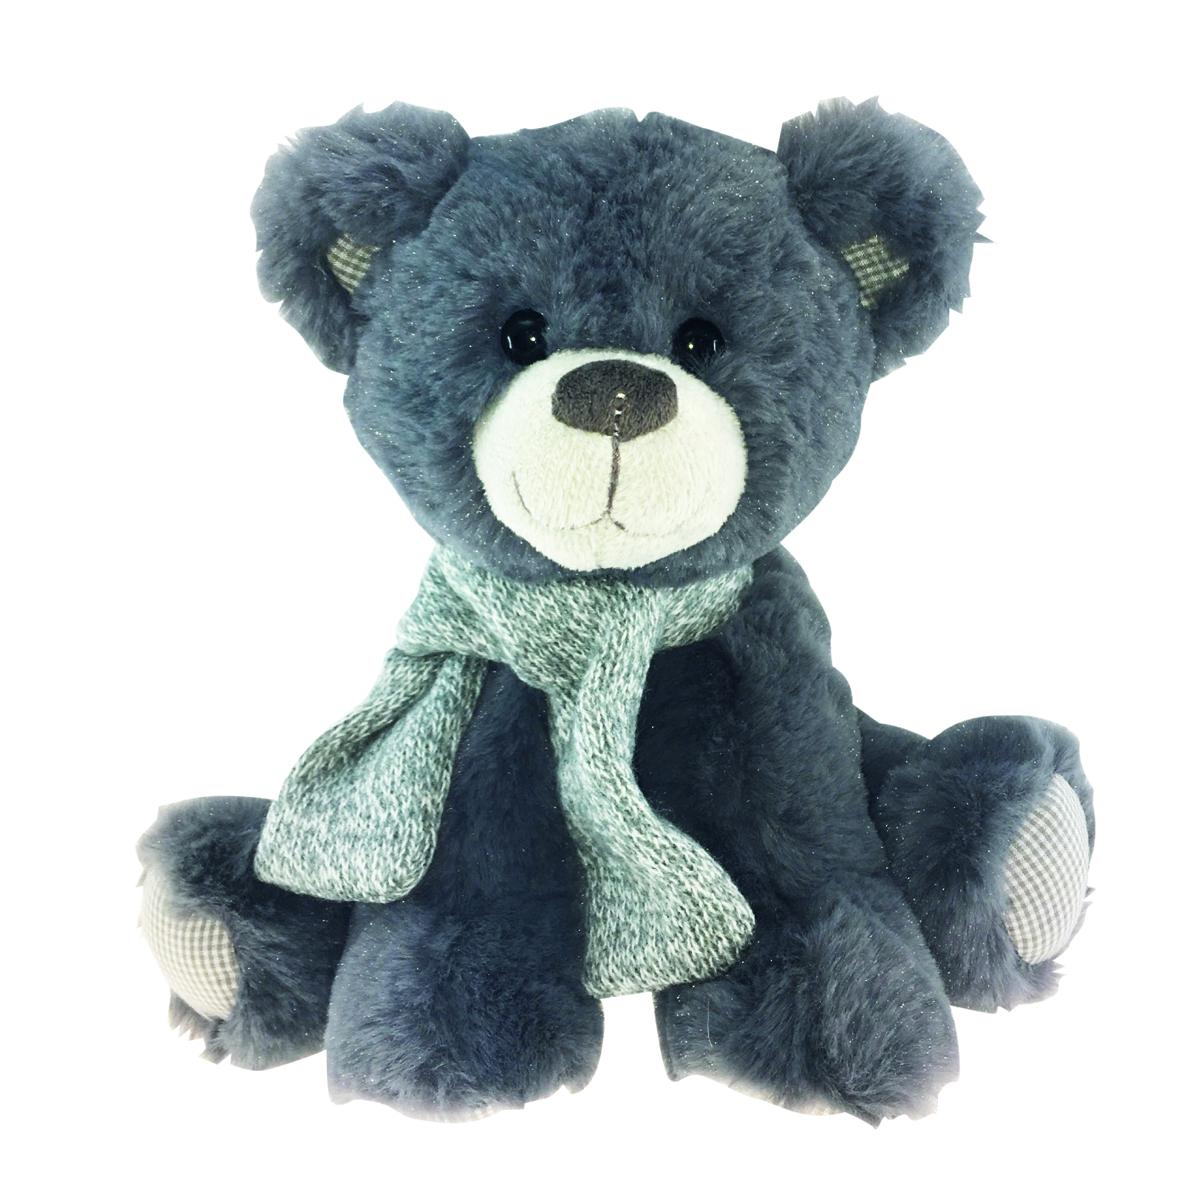 Peluche design \'Teddy Bear\' gris - 25 cm - [Q3909]